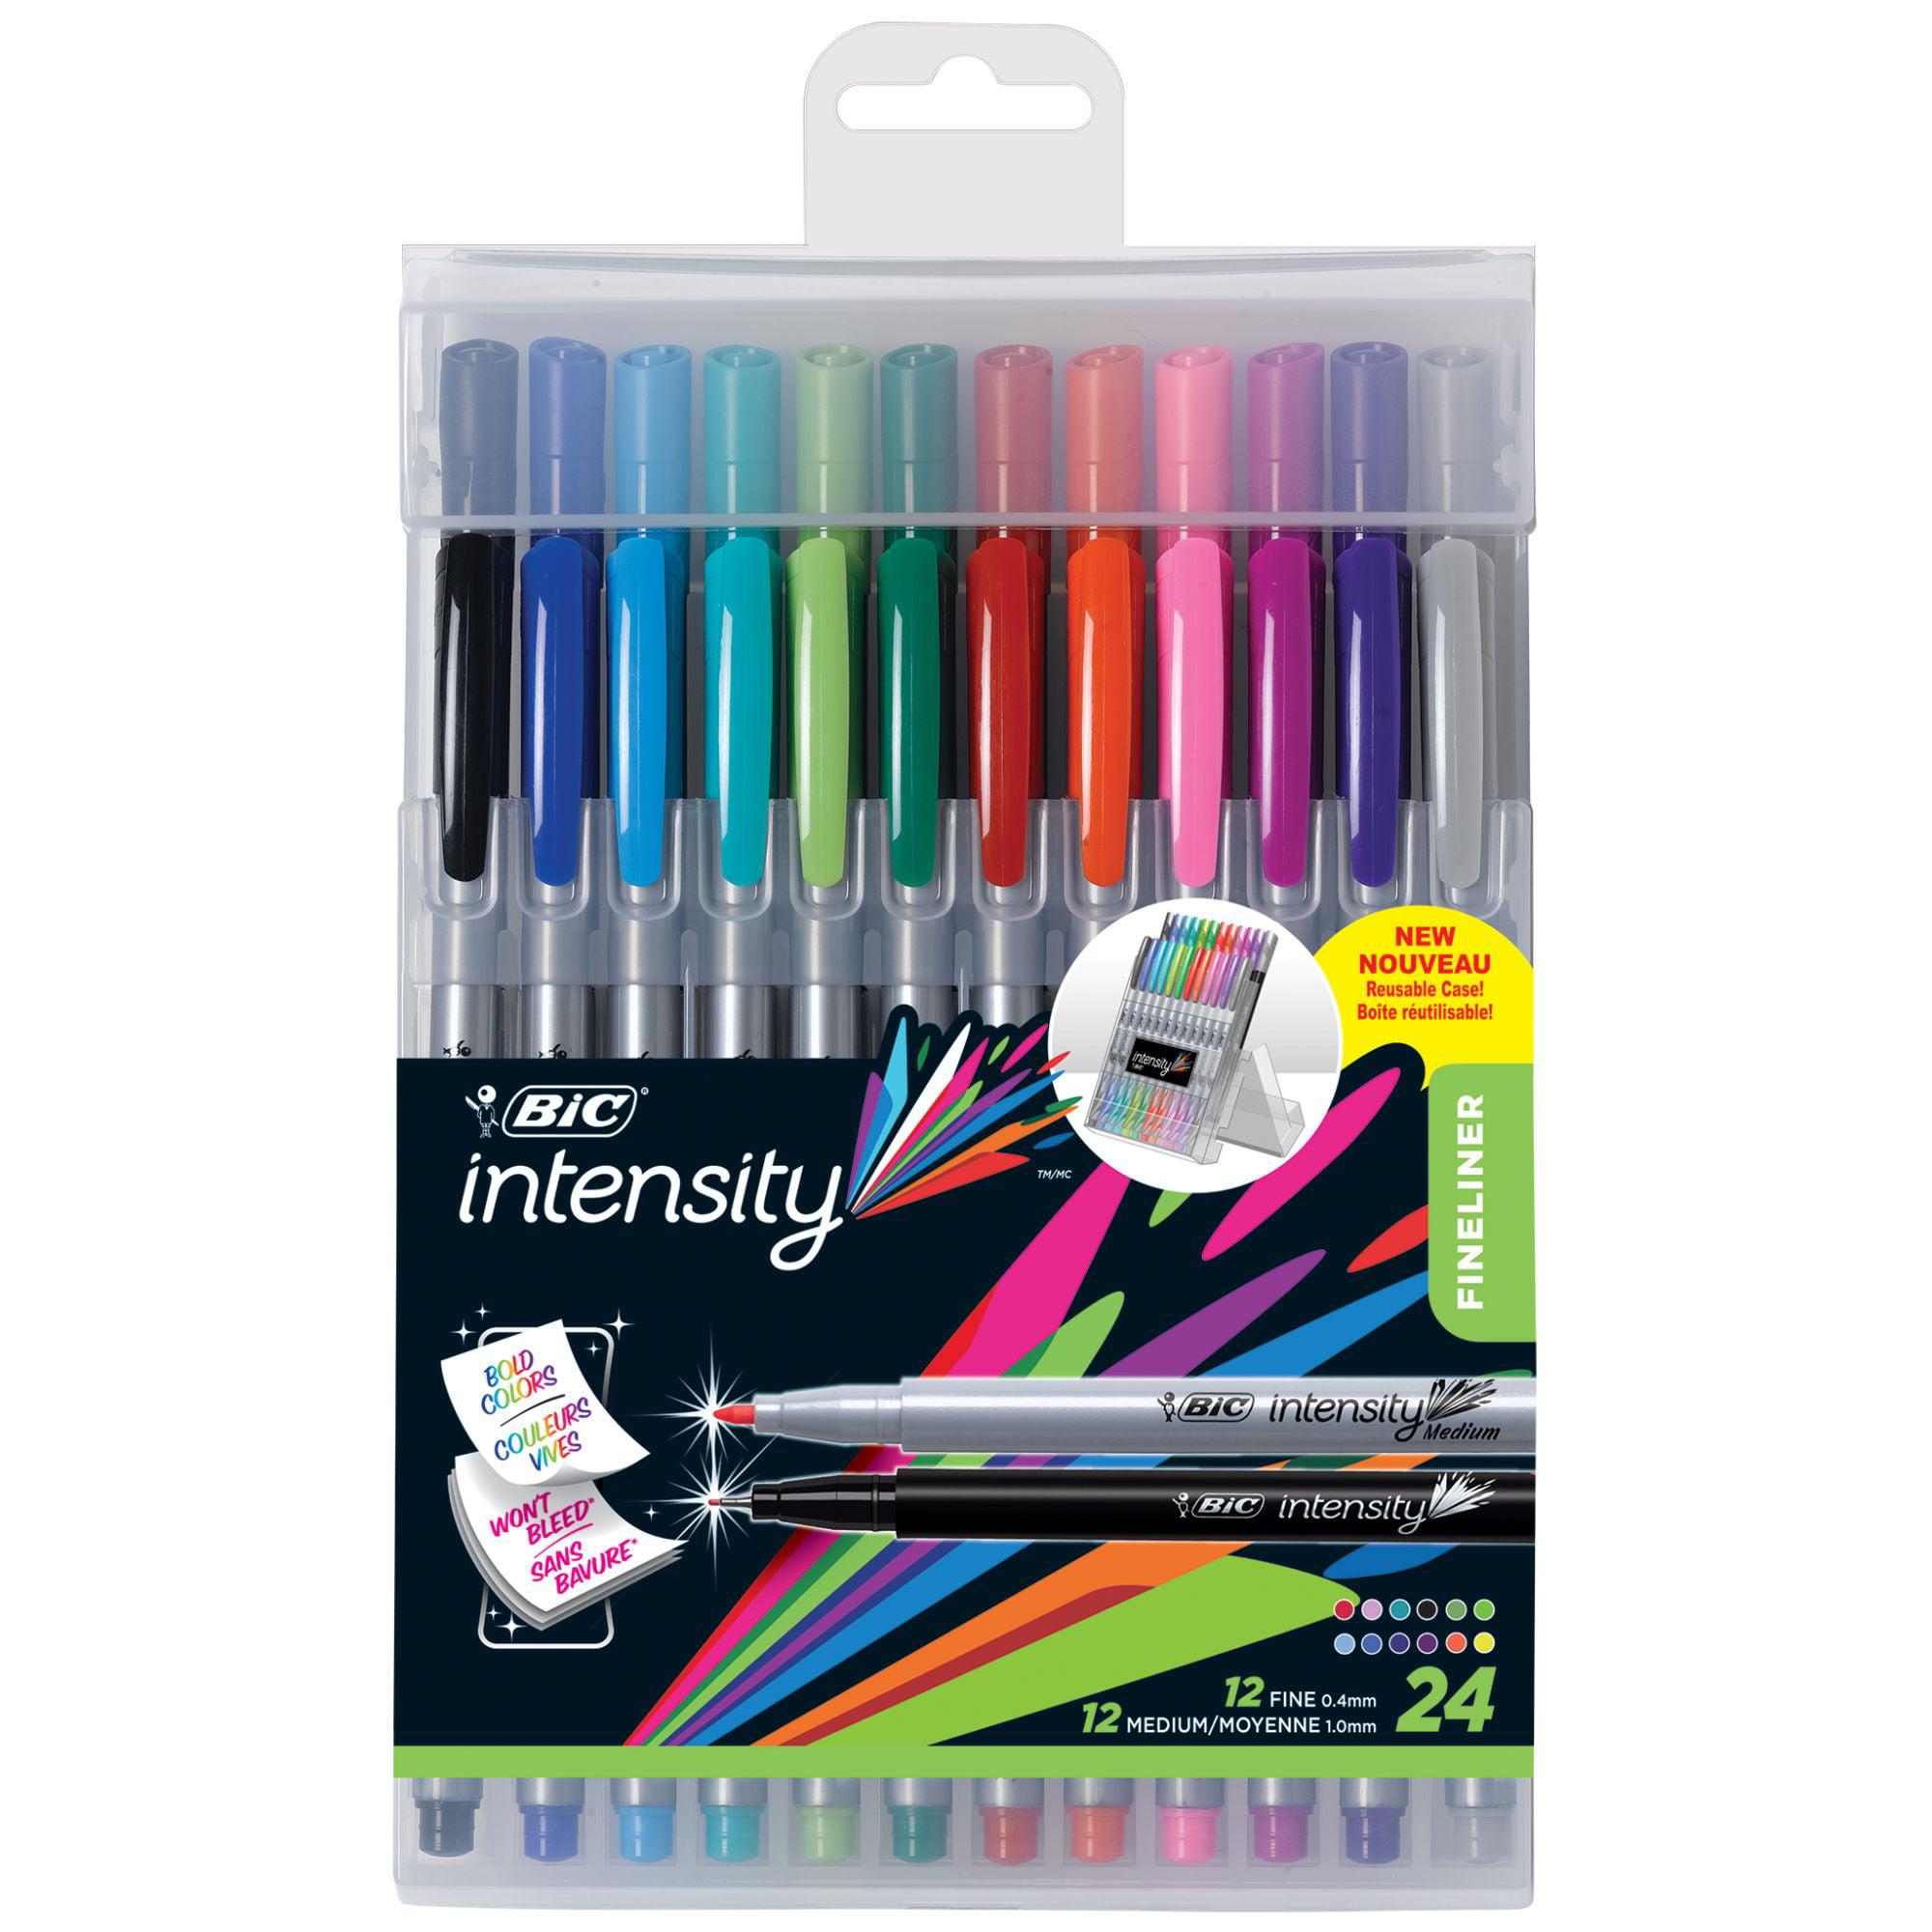 Hard Case Easel 12 Pack Fineliner Sharpie Art Pens Fine Point Assorted Colors